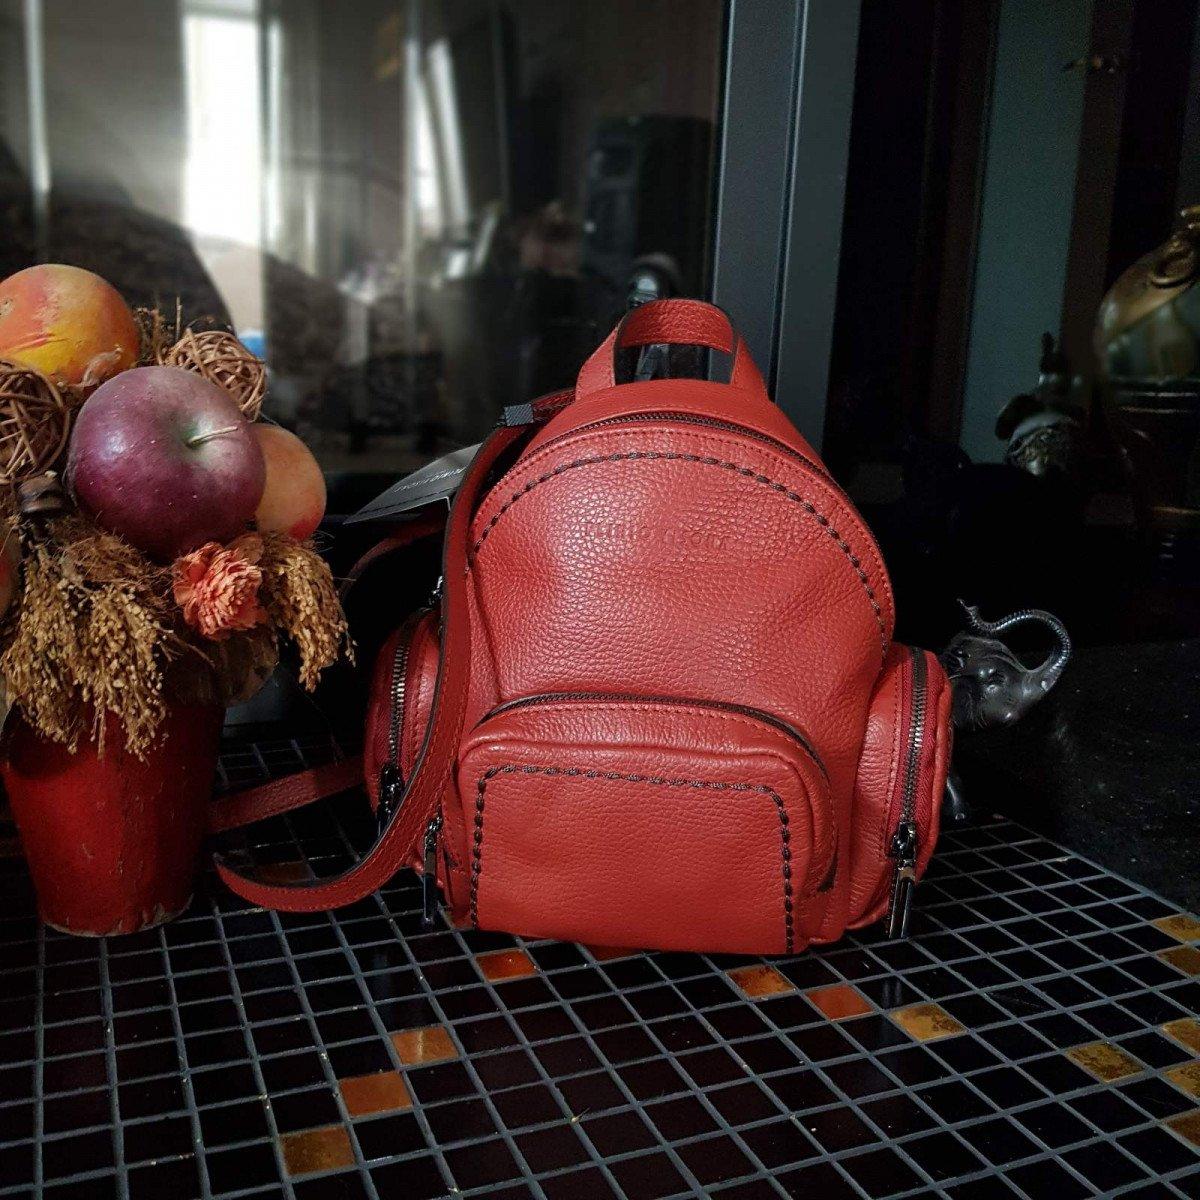 Женский кожаный рюкзак Plinio Visona 19562 California MATTONE из натуральной кожи